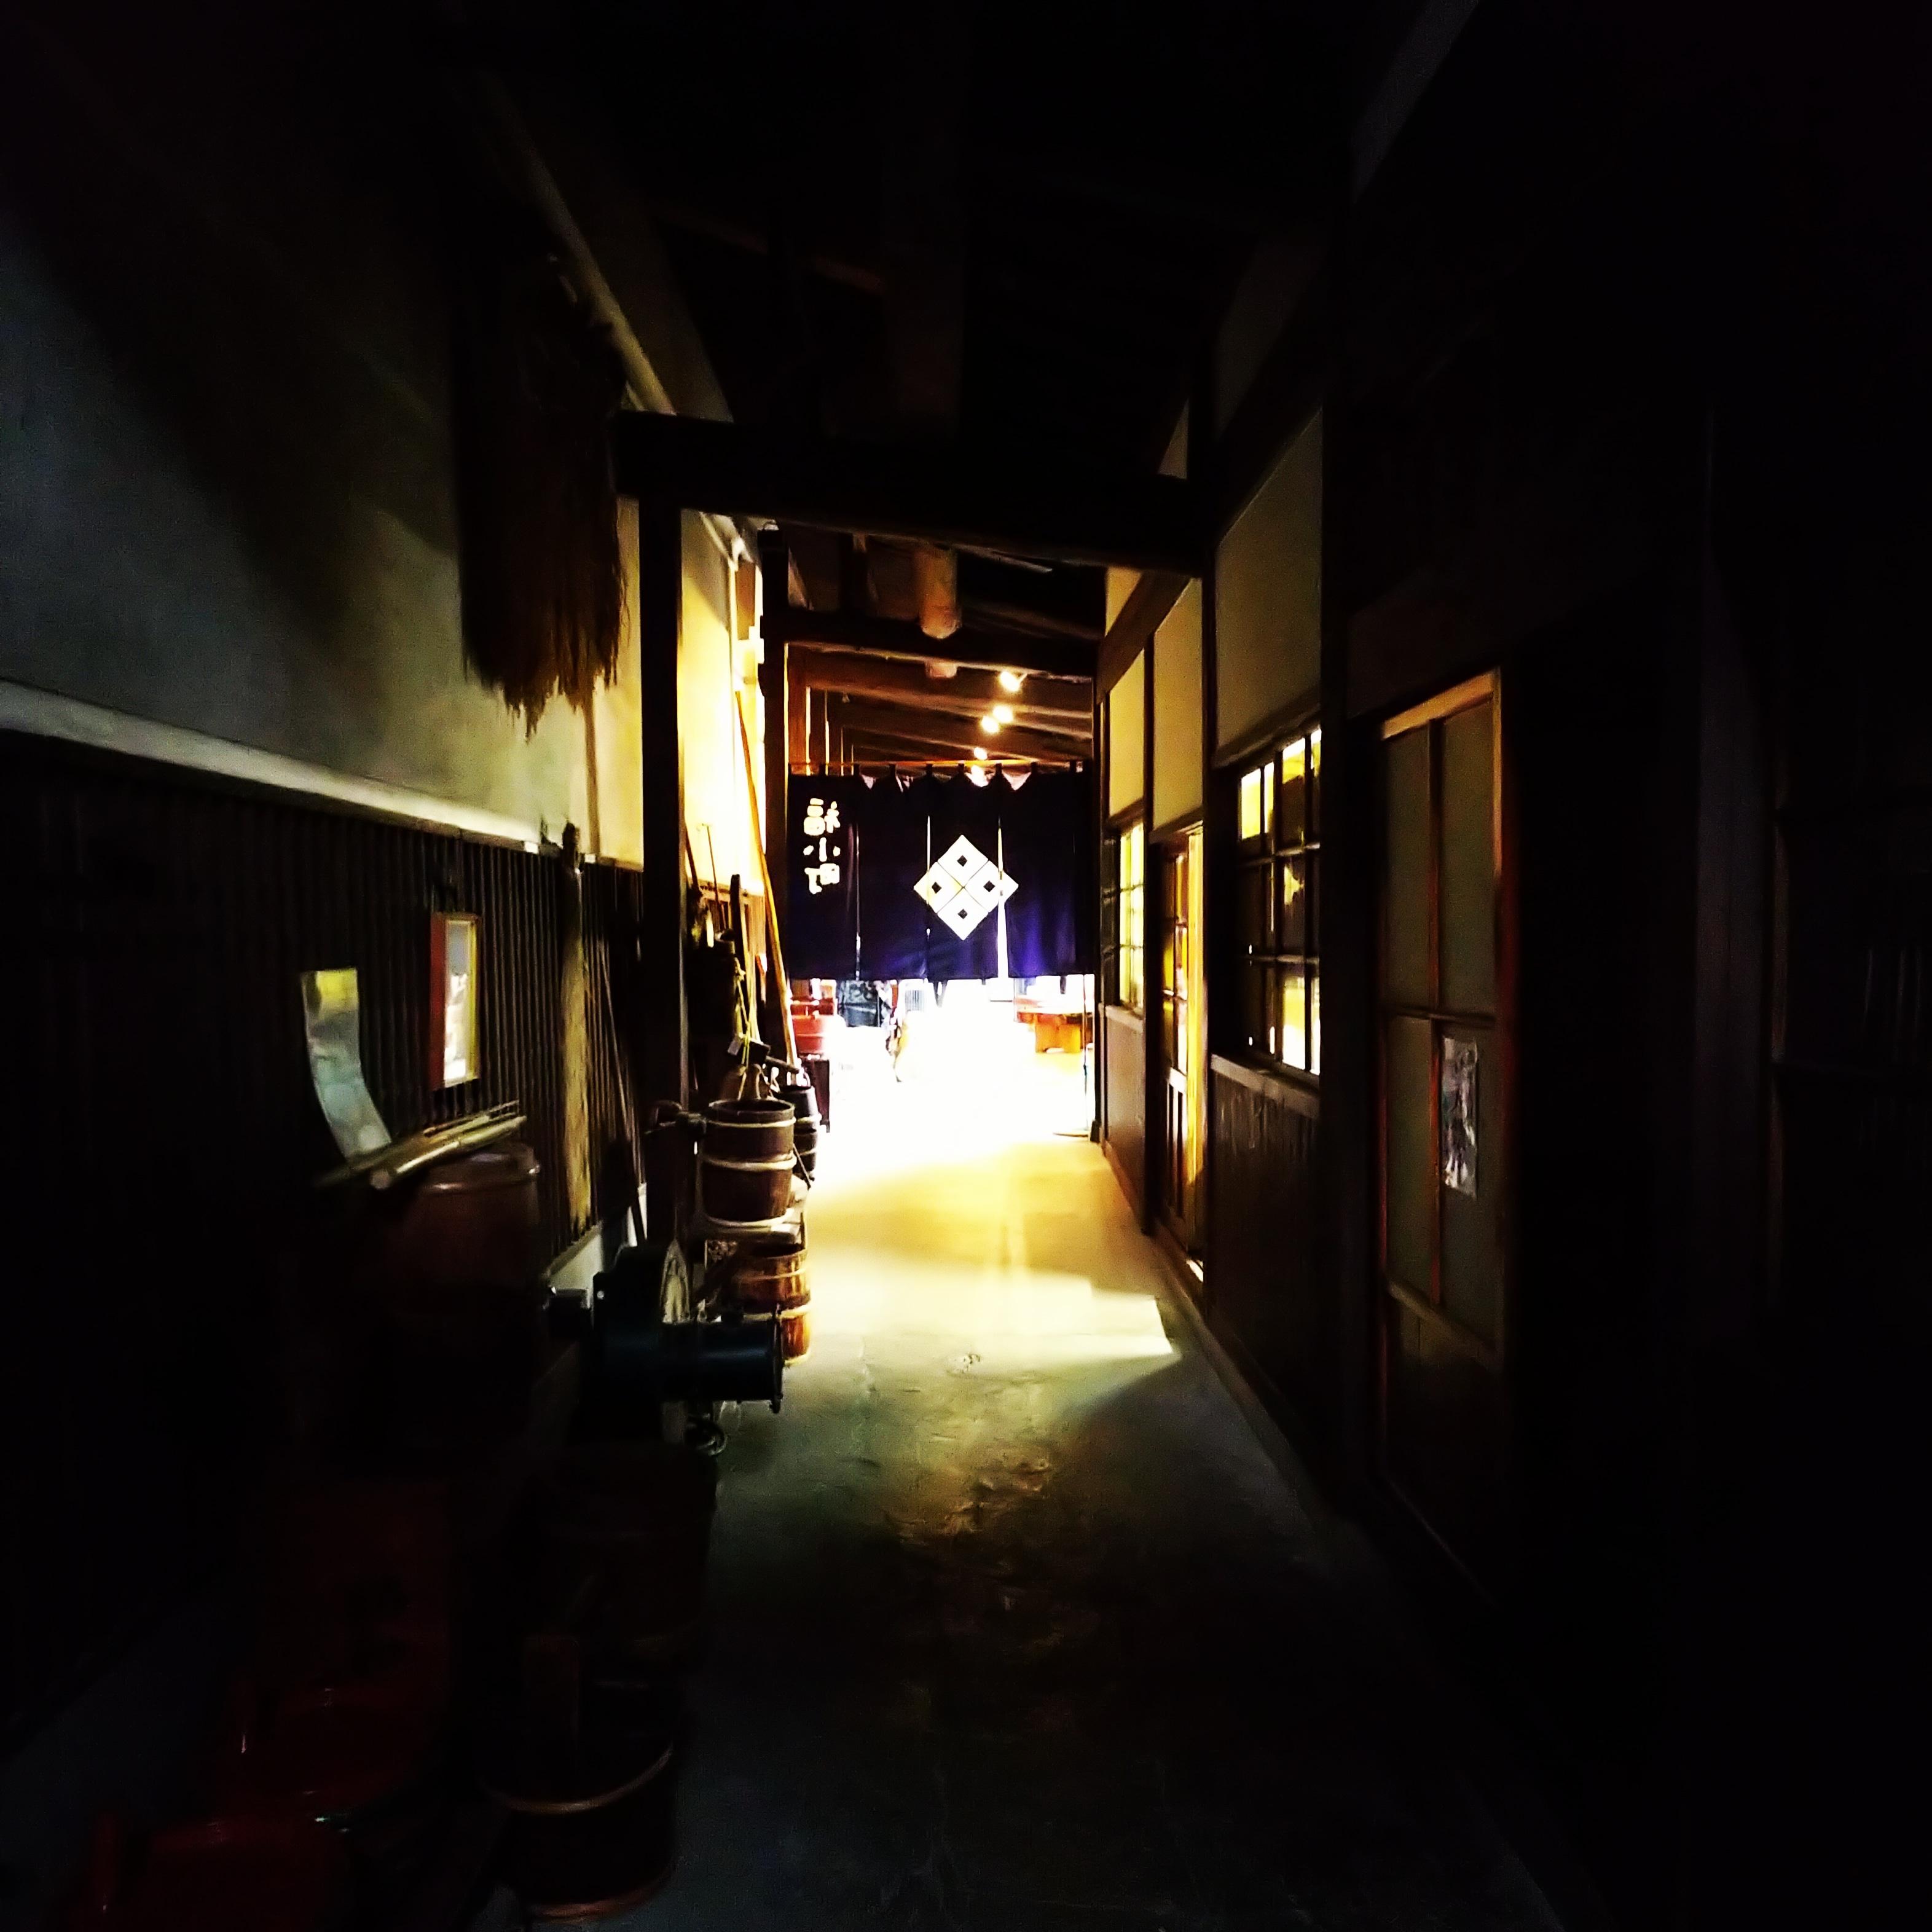 http://www.fukukomachi.com/blog/photo/IMG_20200731_191746_918.jpg